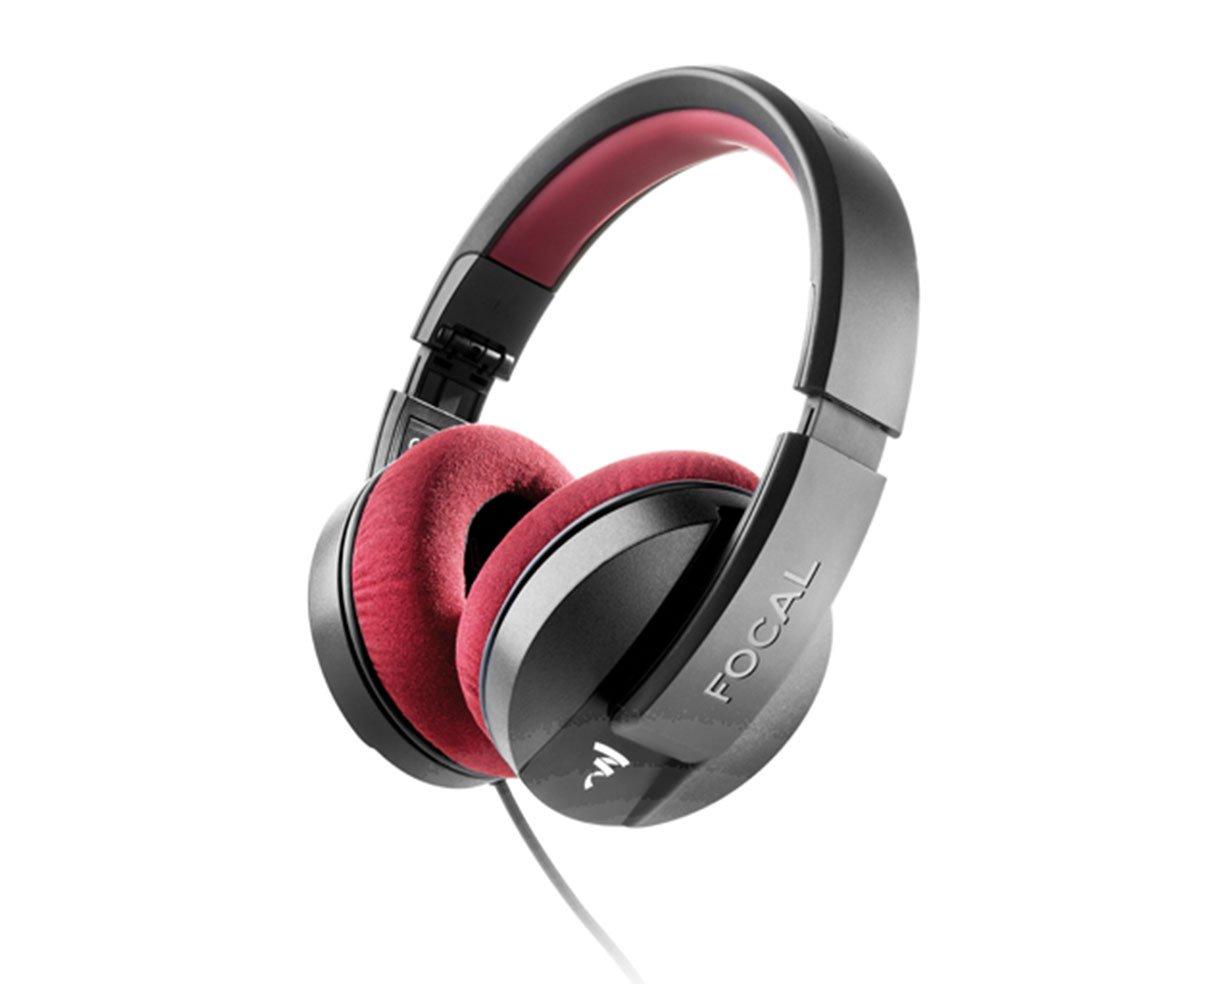 Focal Listen Pro Professional Closed-Back Circumaural Studio Headphones